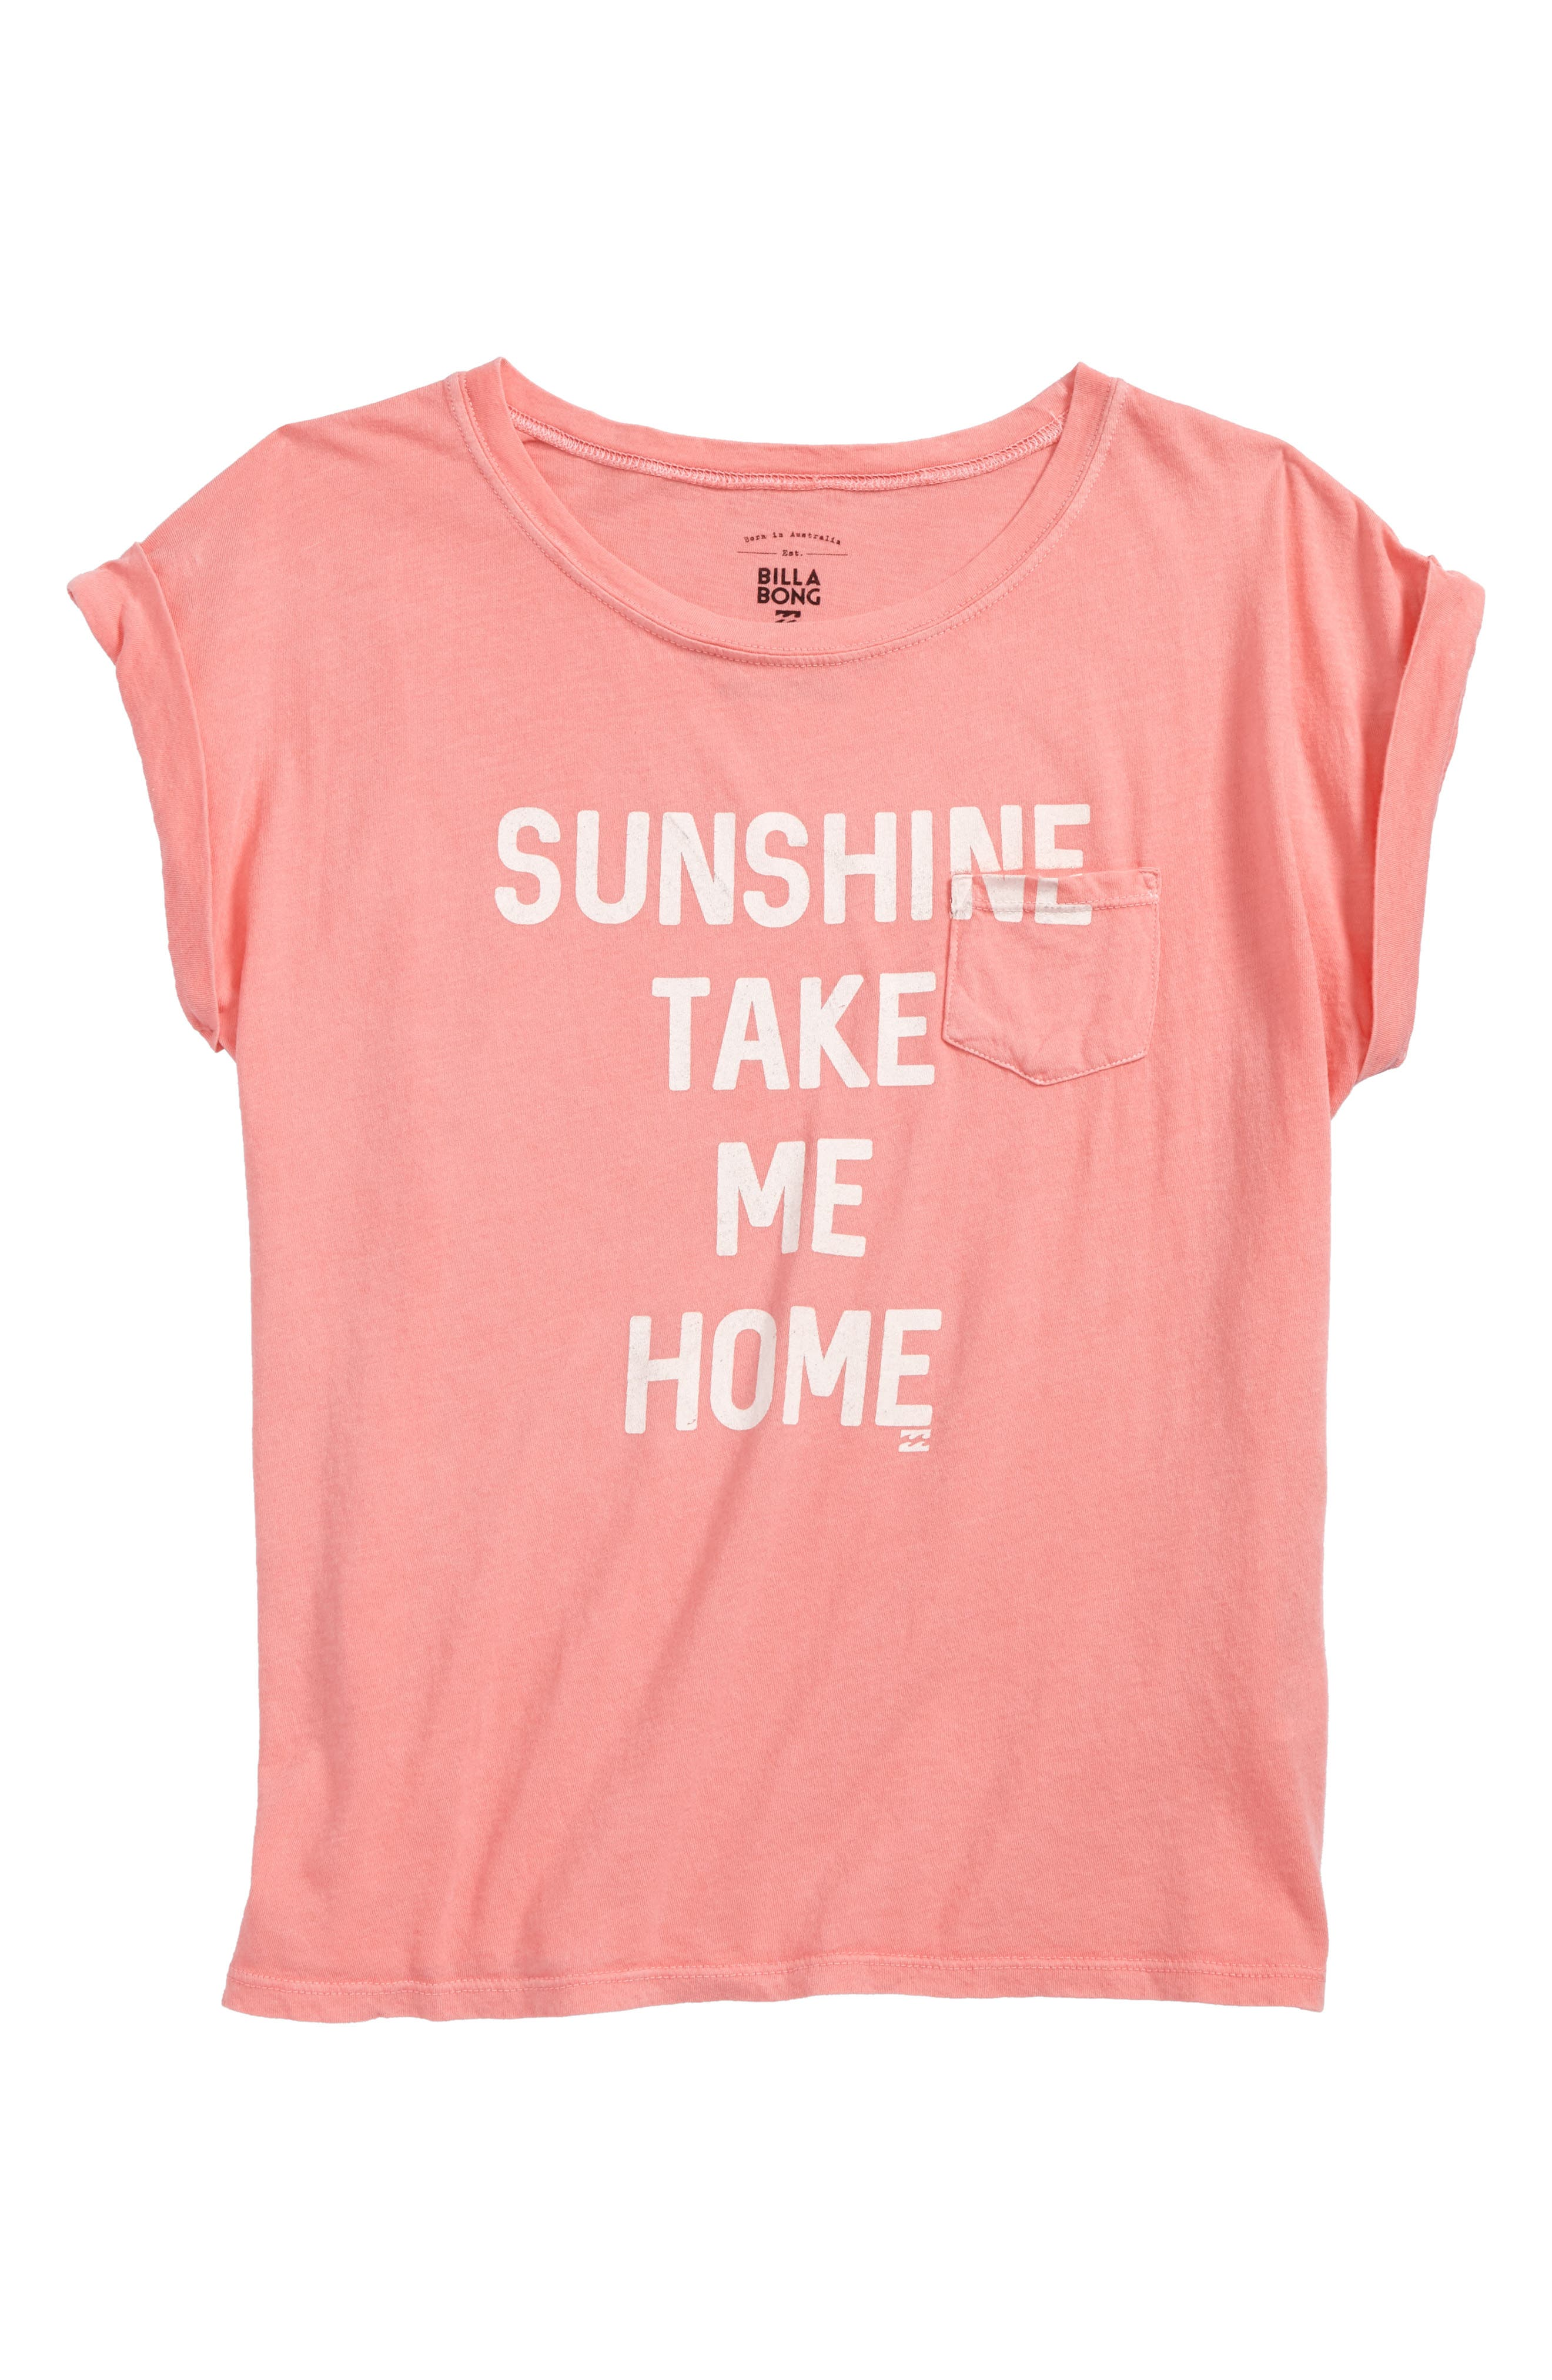 Billabong Sunshine Take Me Home Graphic Tee (Little Girls & Big Girls)